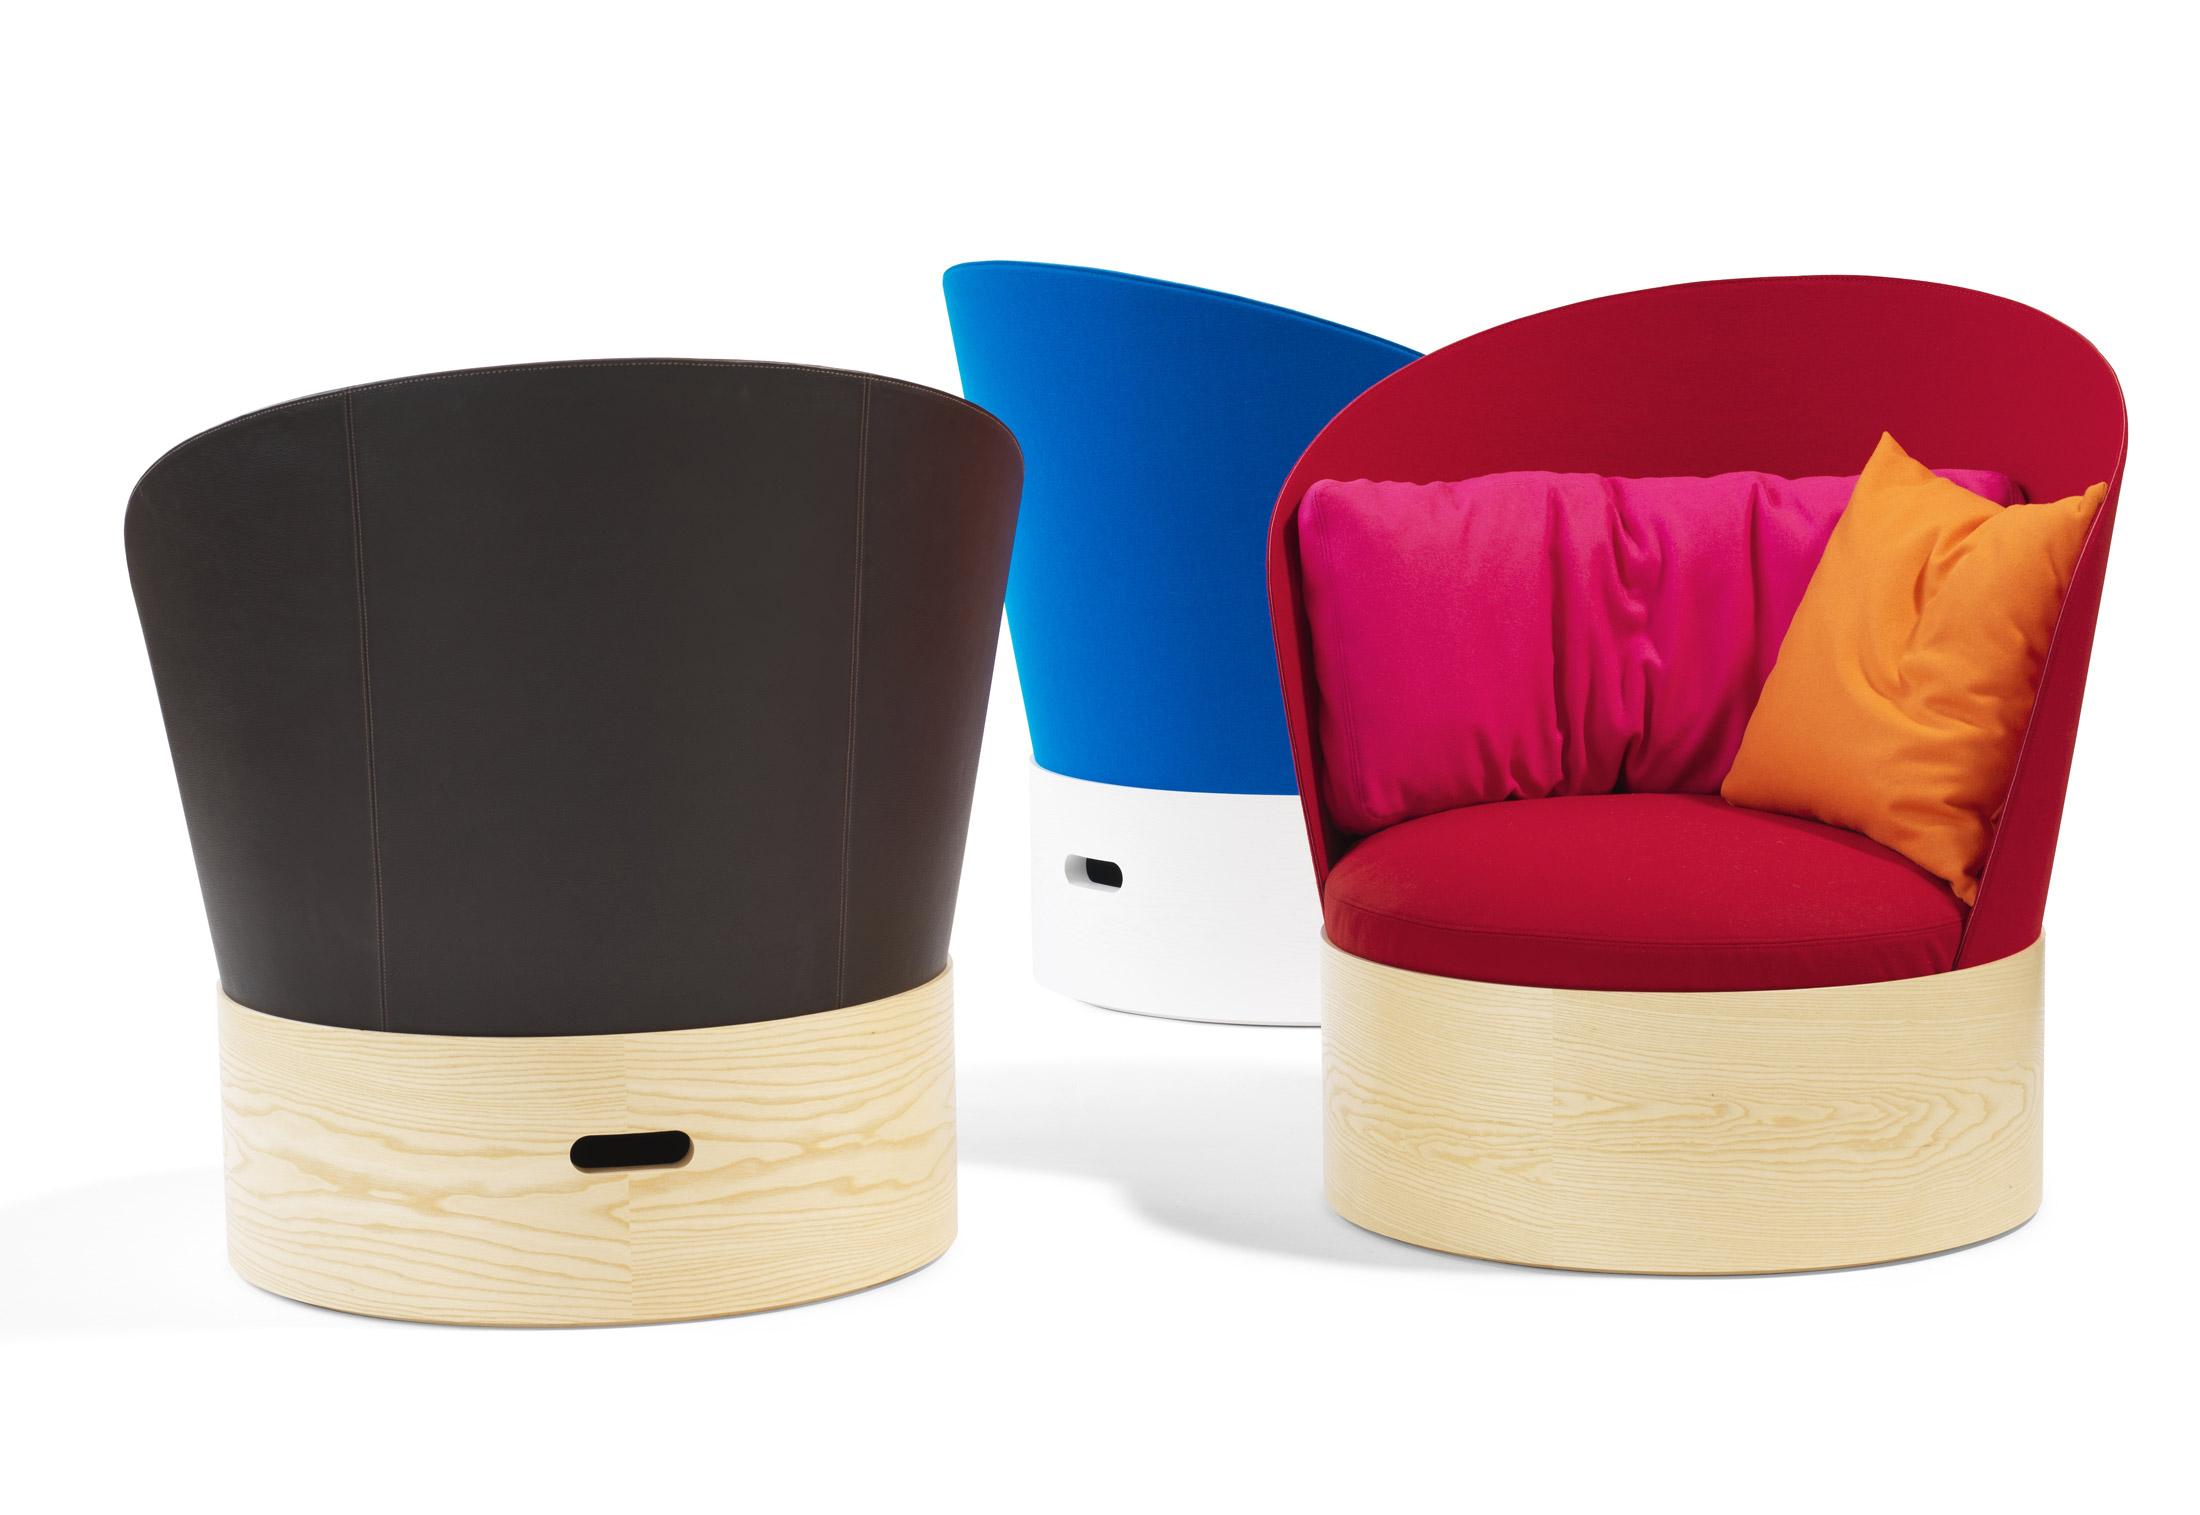 Круглое кресло (77 фото): полукруглое мягкое кресло своими р.